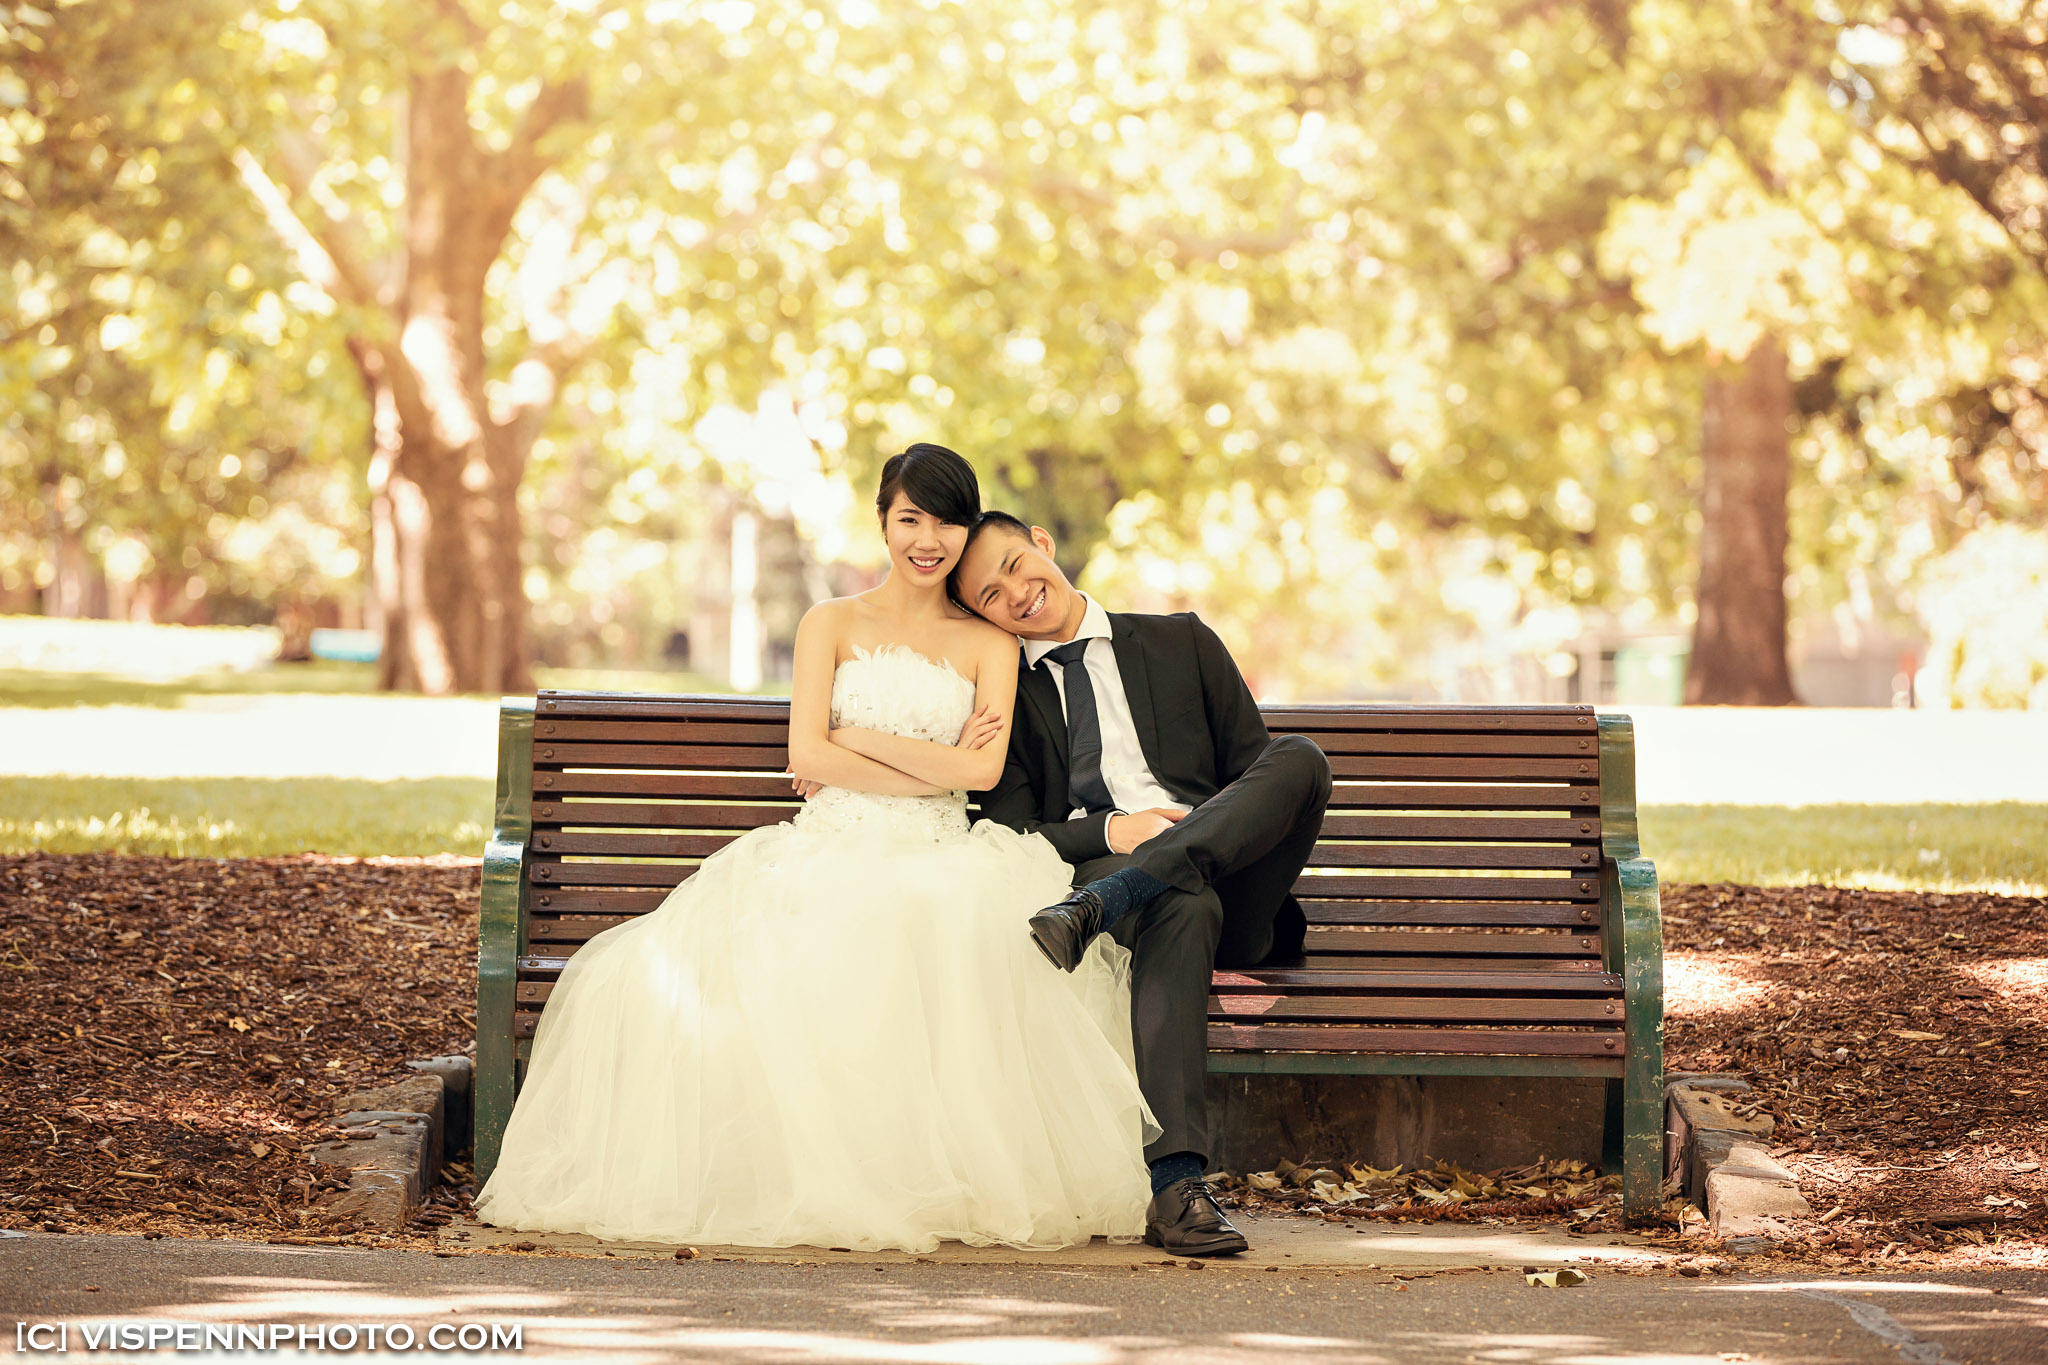 PRE WEDDING Photography Melbourne VISPENN 墨尔本 婚纱照 结婚照 婚纱摄影 Ivy PreWedding 1691